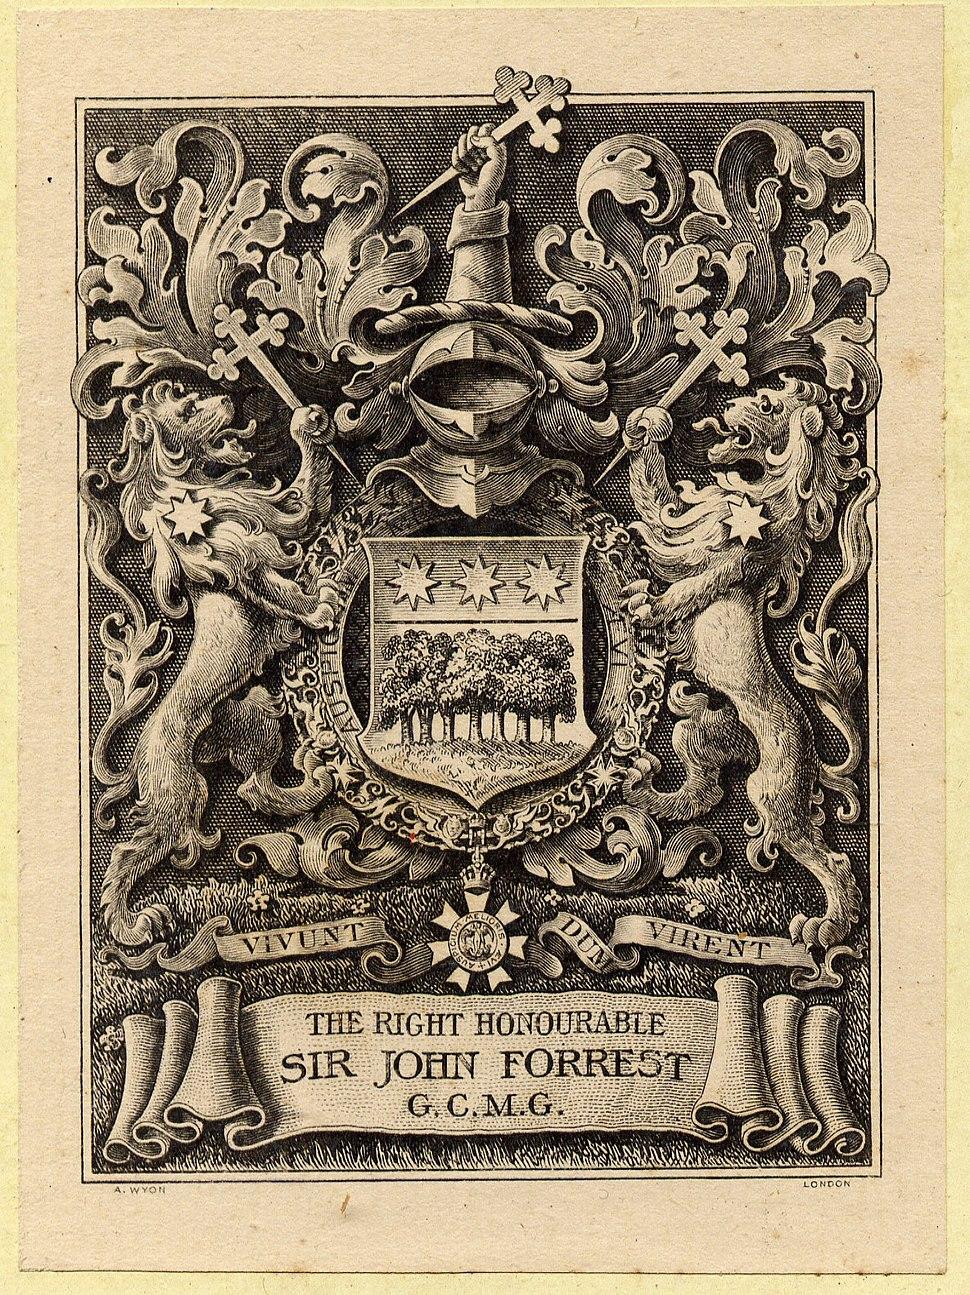 John Forrest bookplate